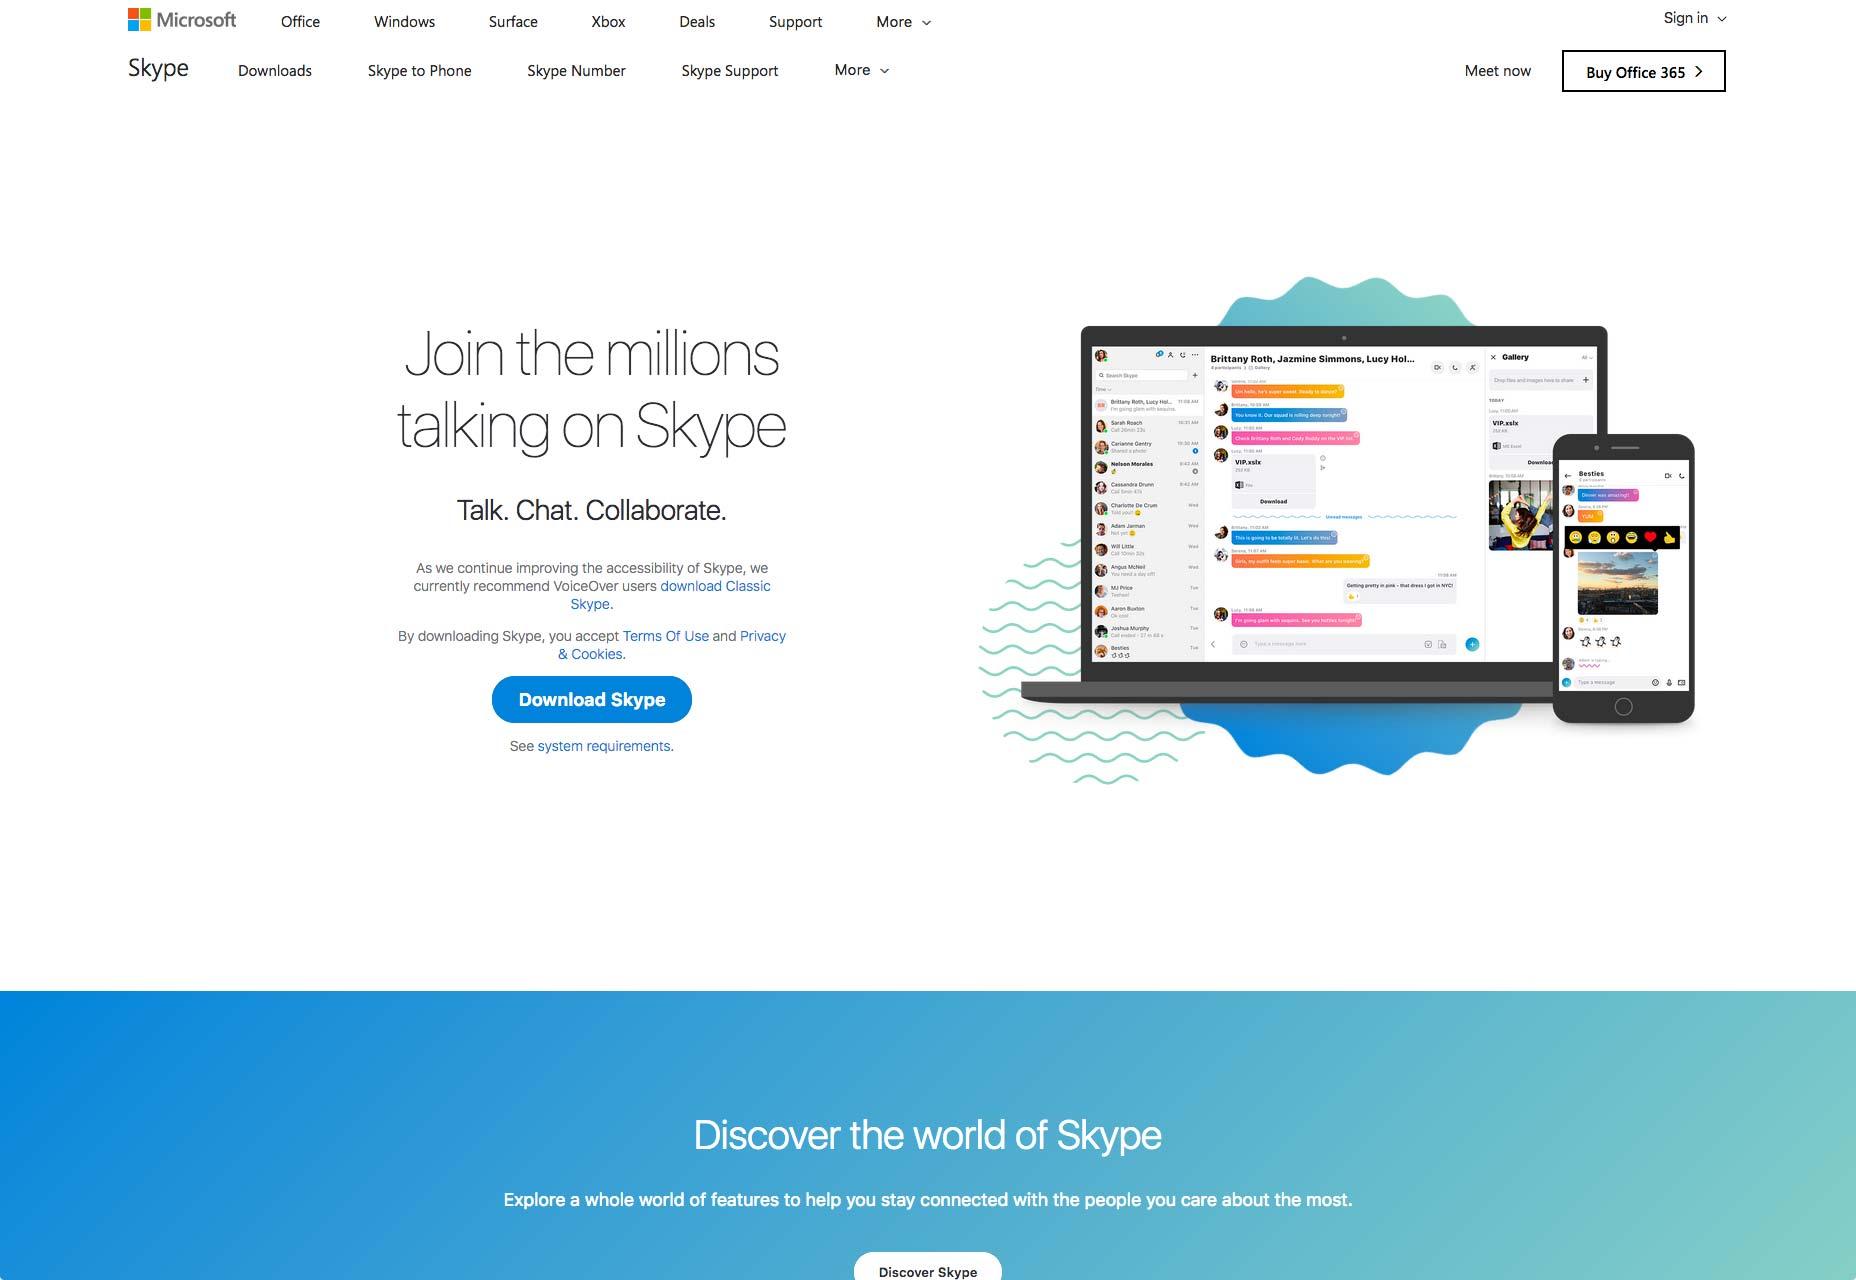 004_skype